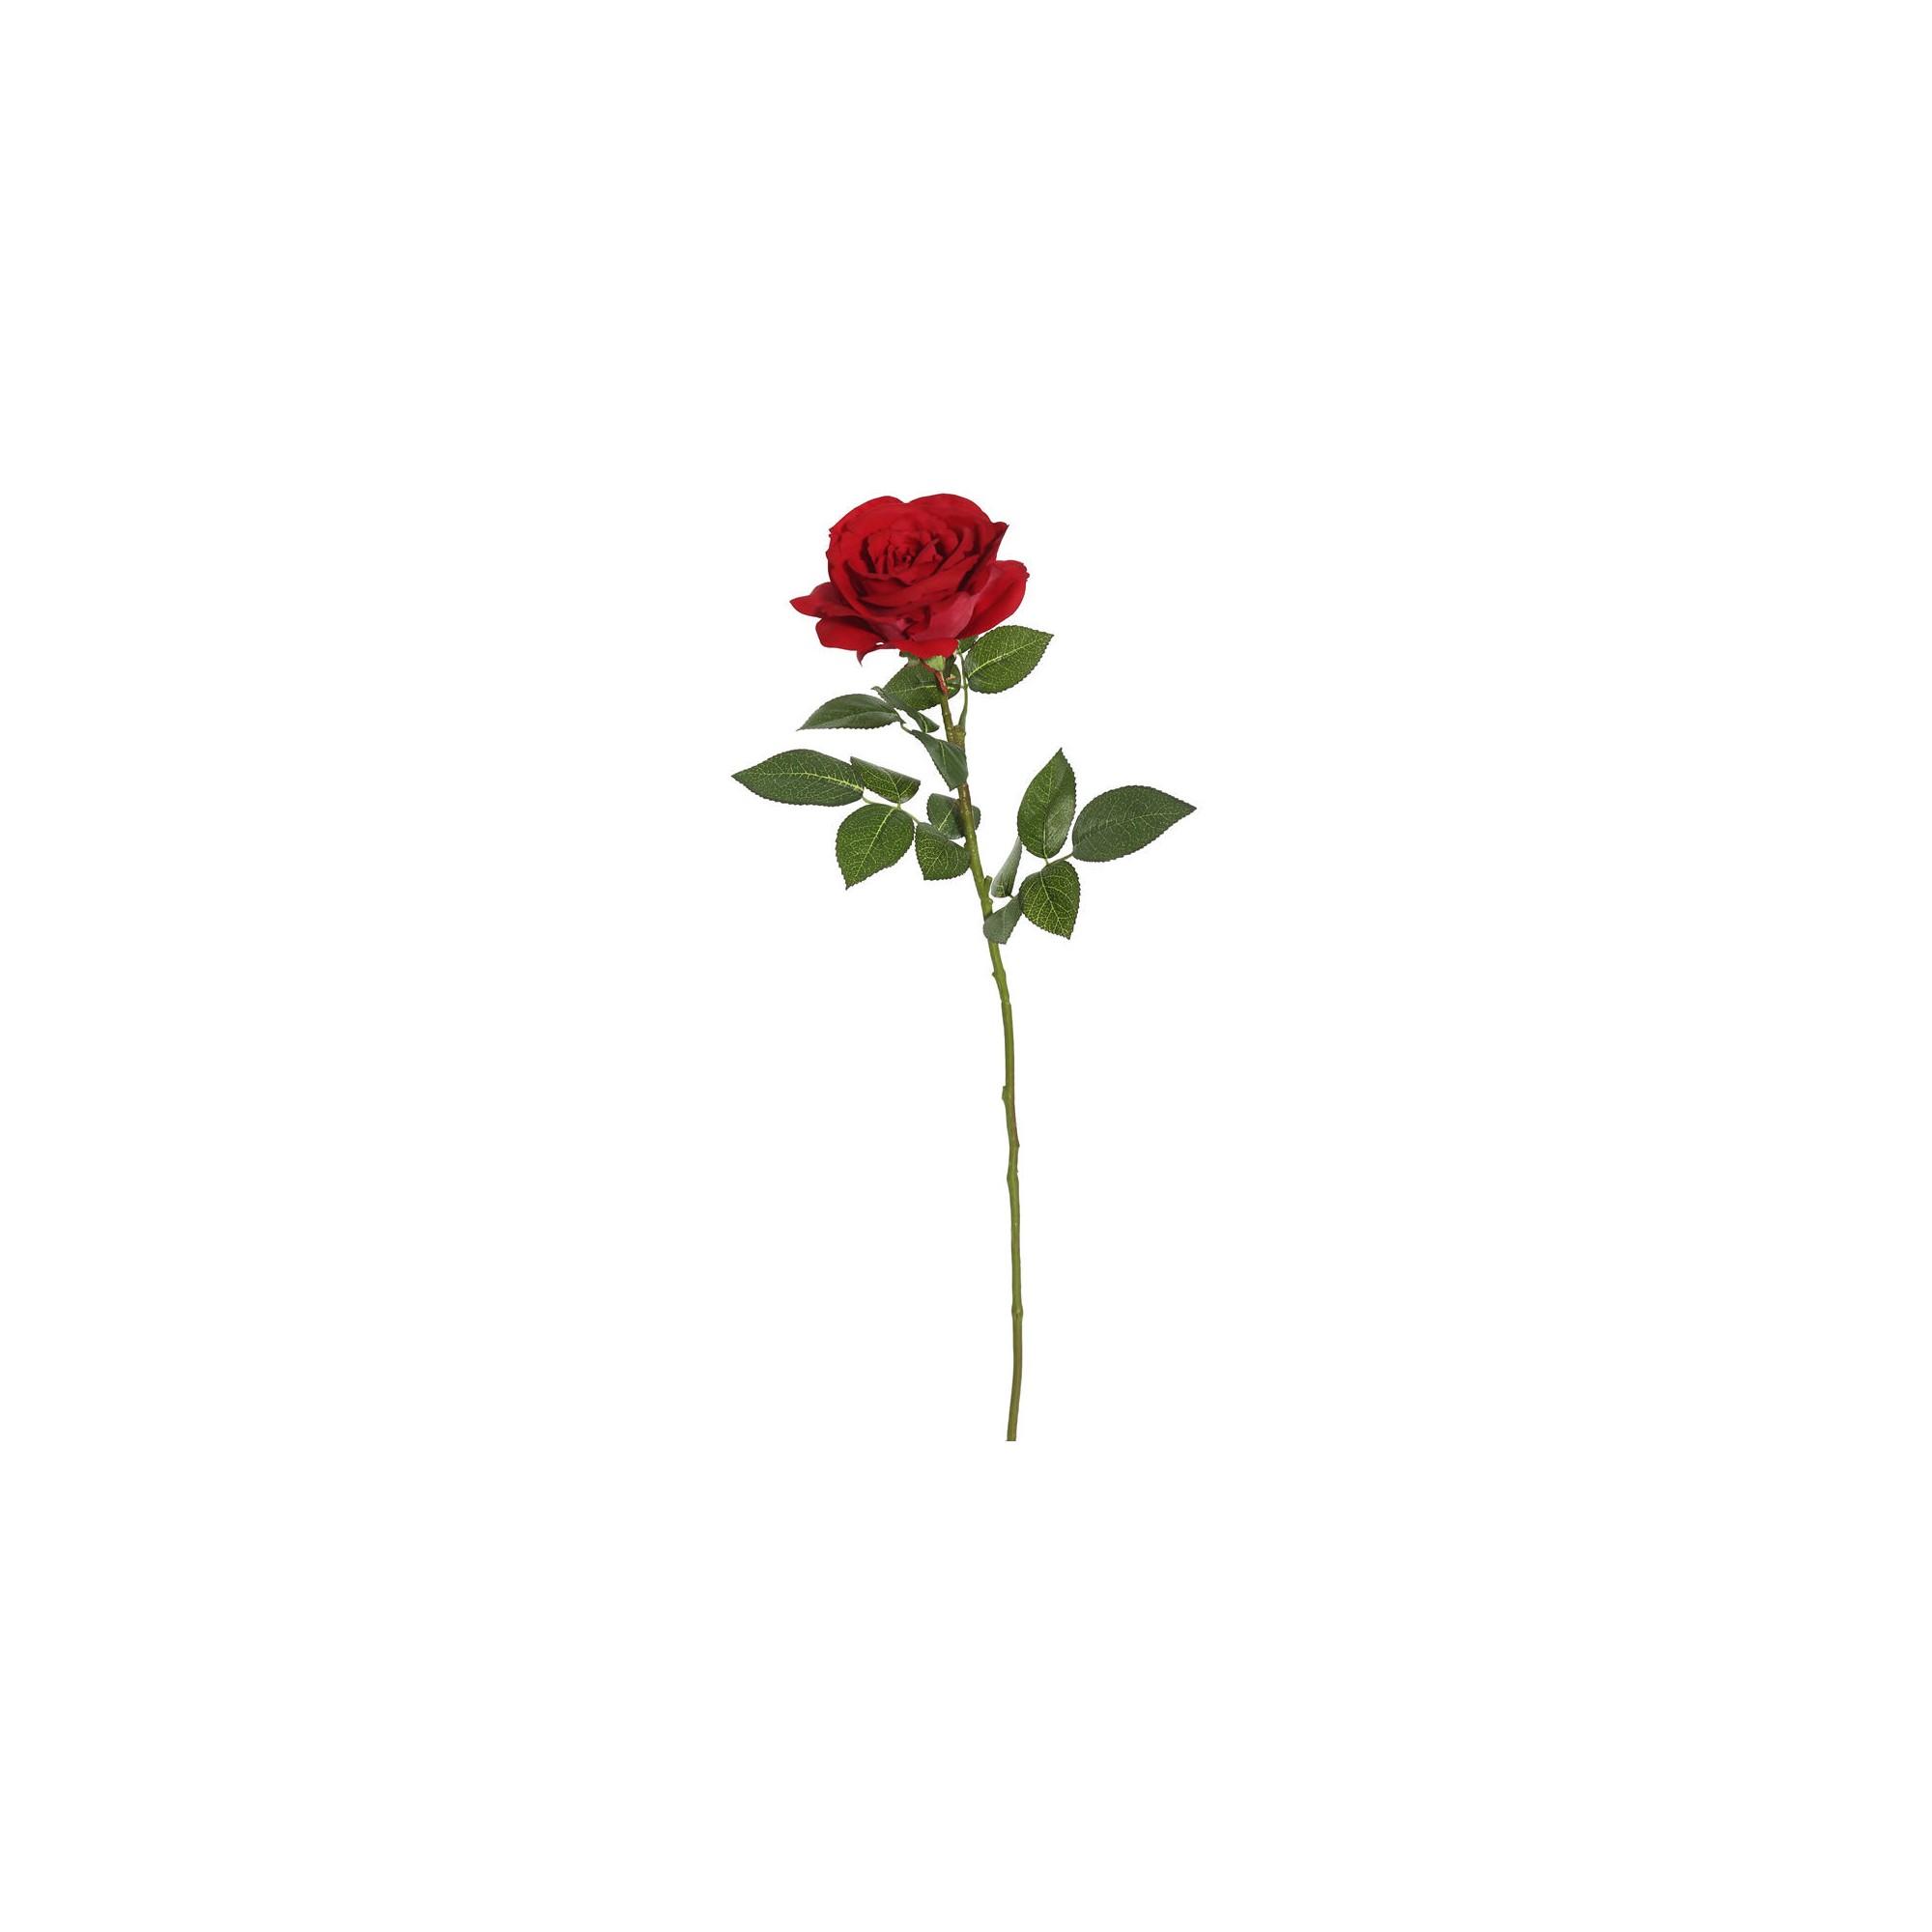 e99094181674b0eabe4beb3aaab1f6a5 » Aesthetic Rose Drawing